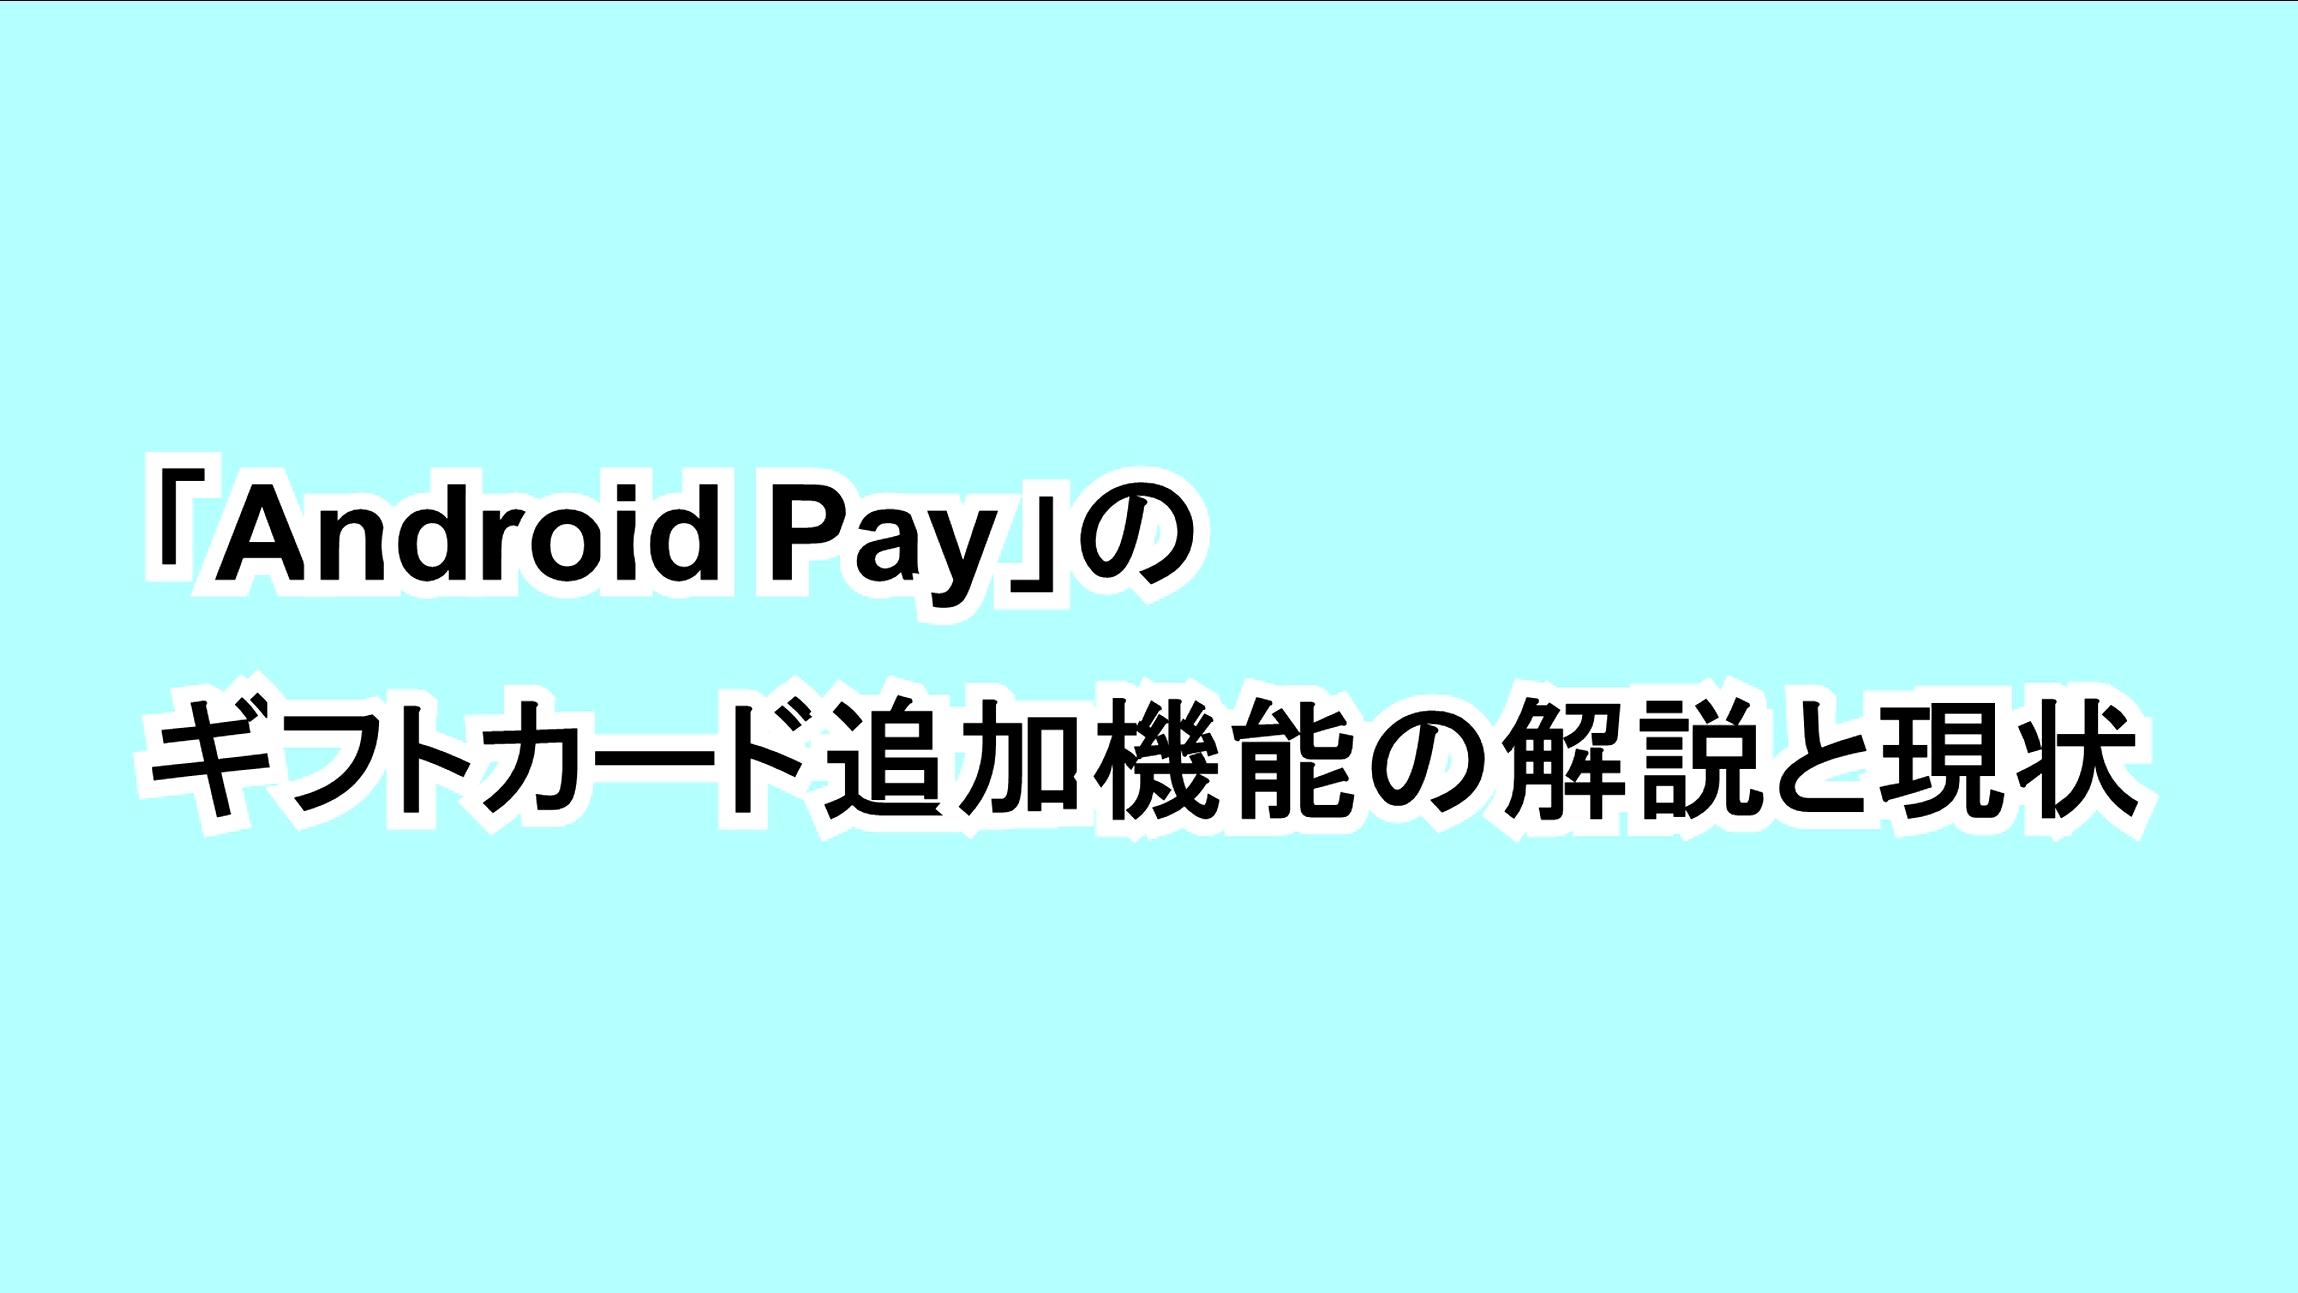 「Android Pay」のギフトカード追加機能の解説と現状